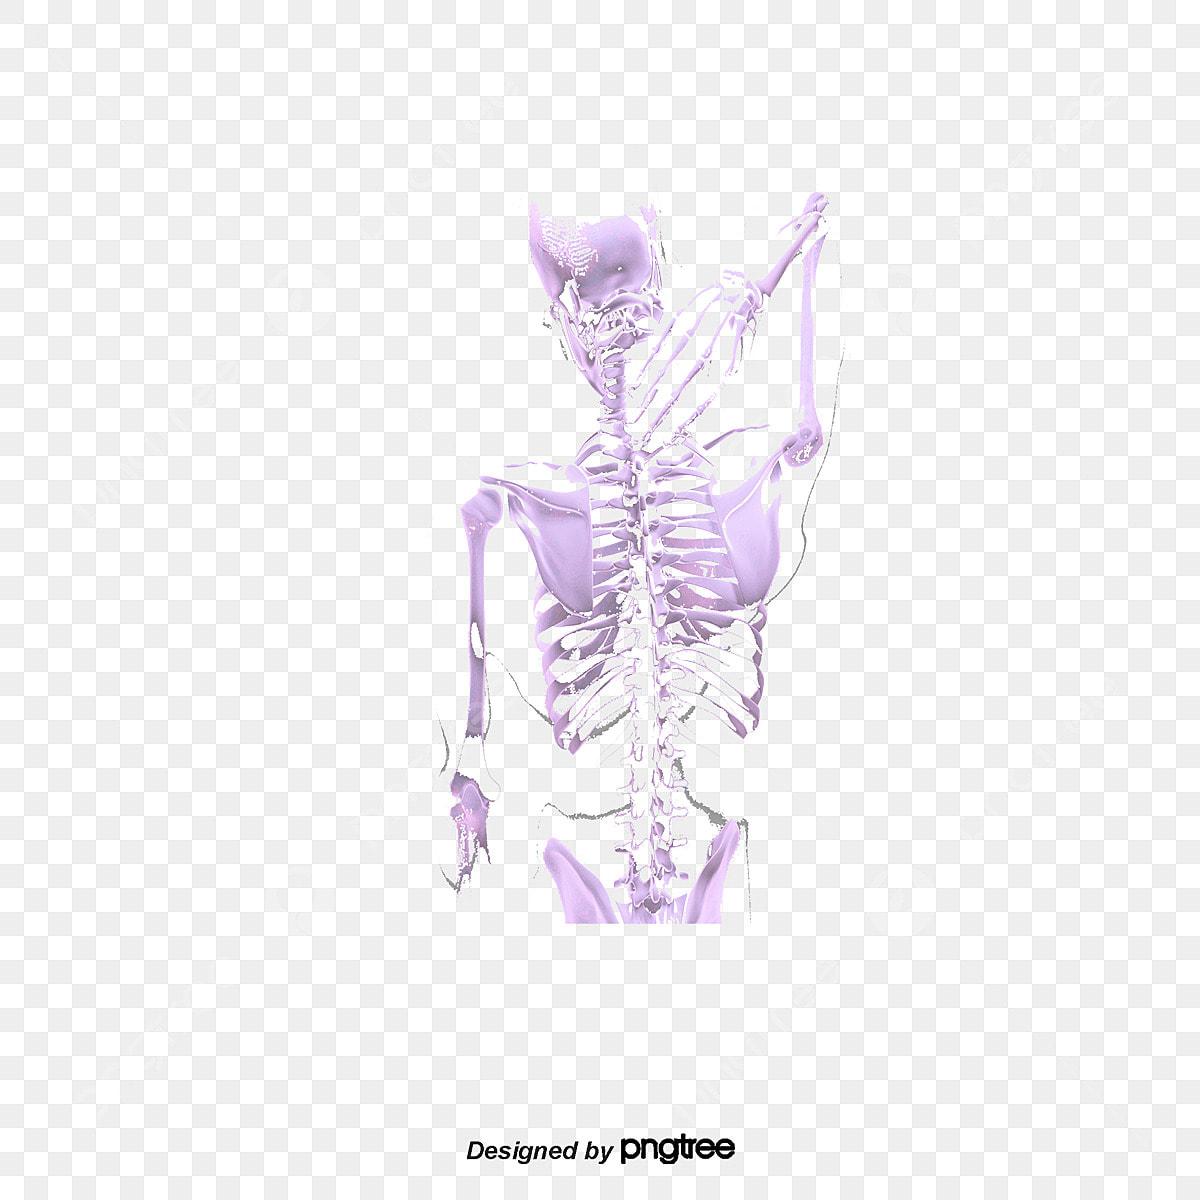 Human Lumbar Vertebrae Inflammation, Arthritis, Lumbar Spine